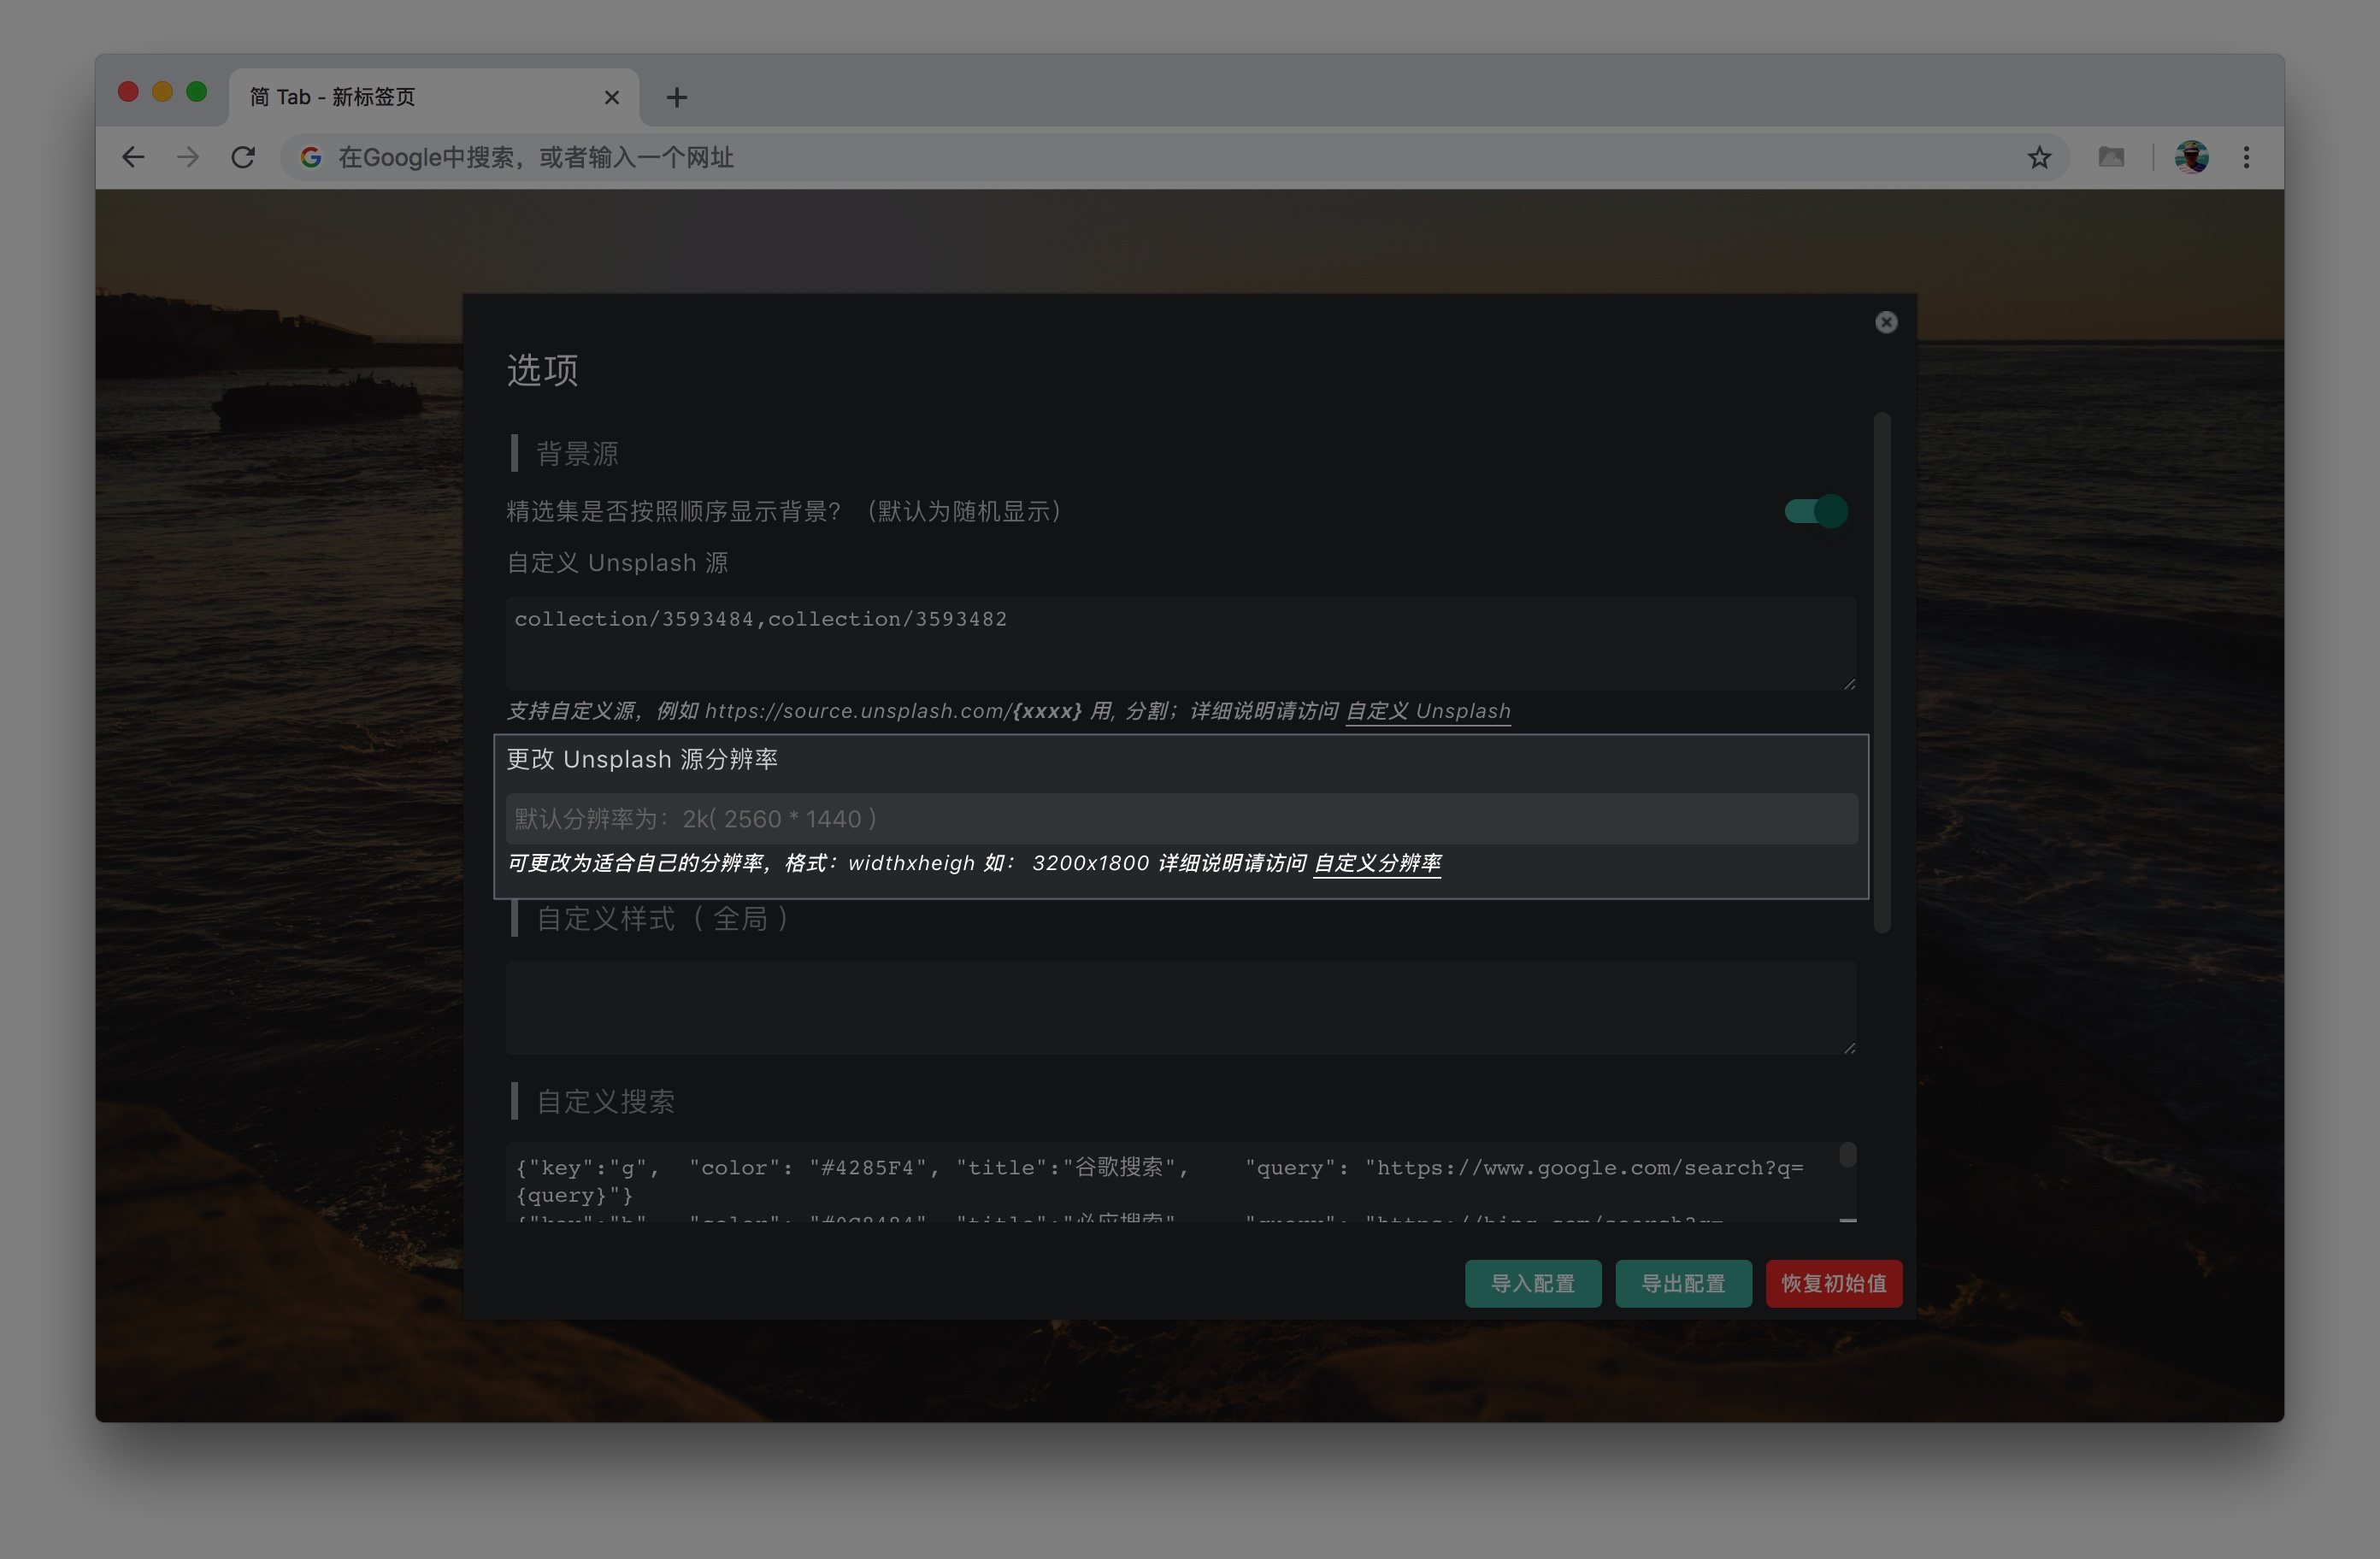 Xnip2018-11-30_11-45-10.jpg